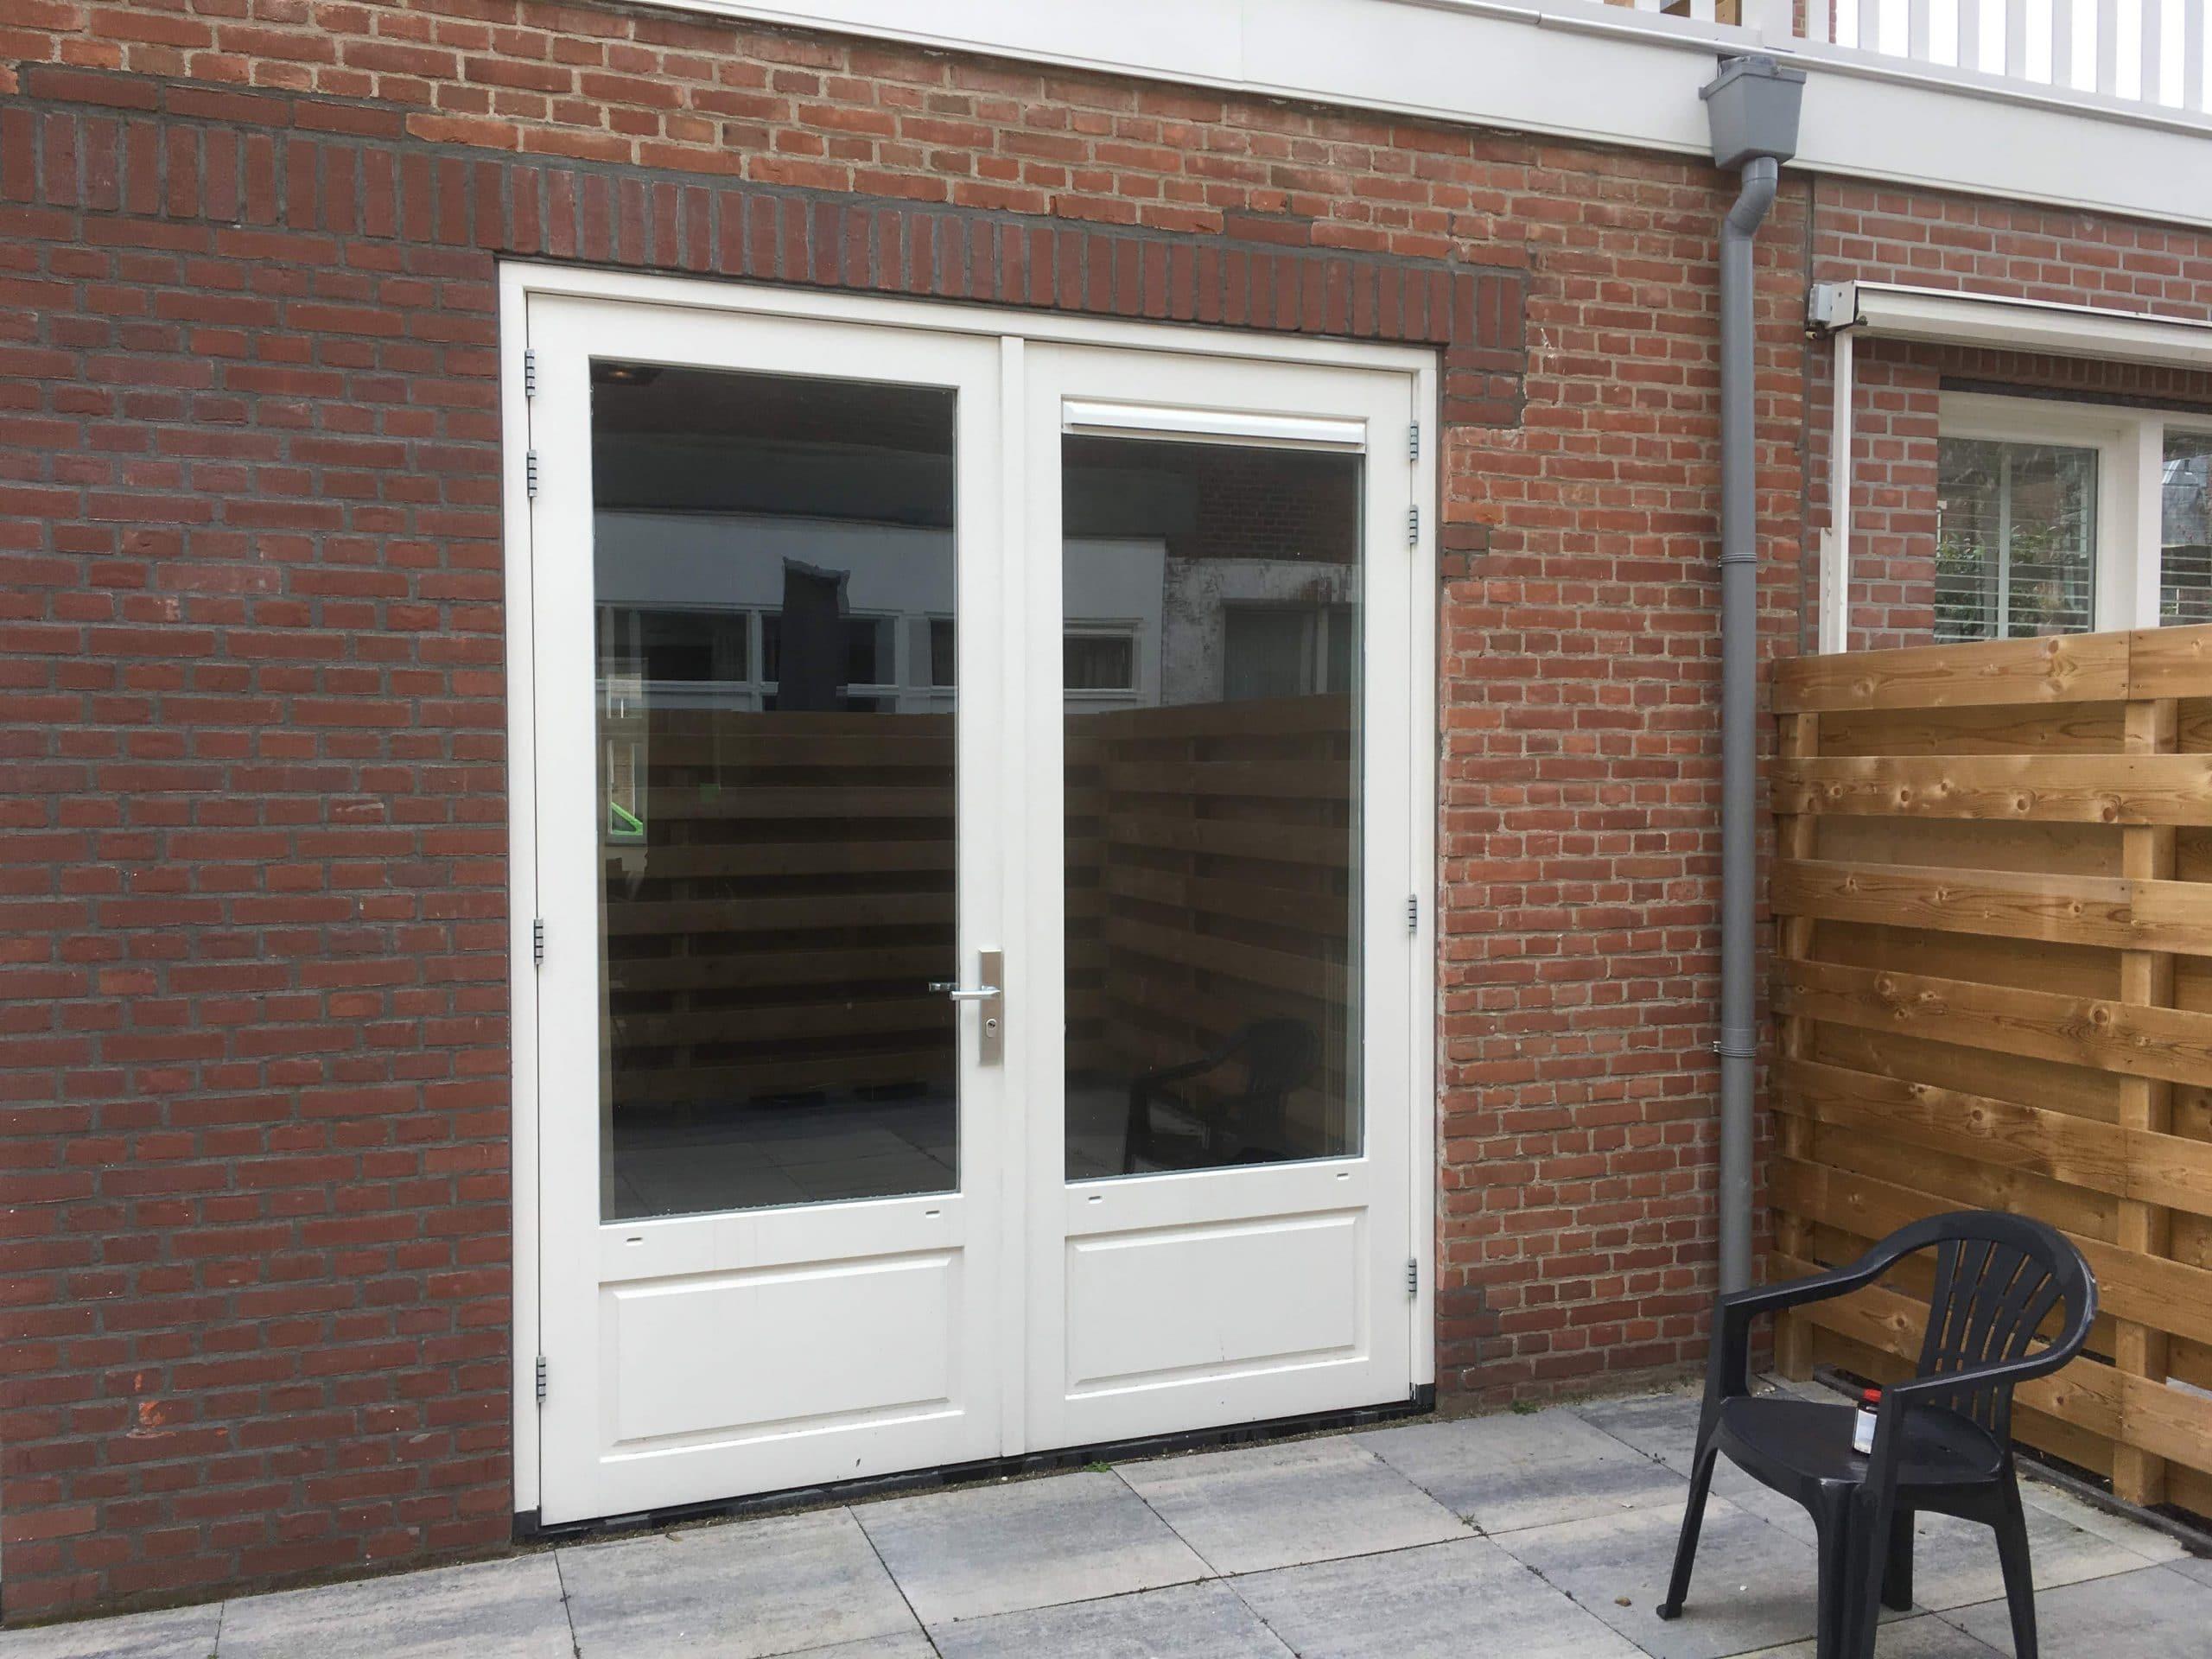 Particulier woonhuis voorzien van Sunblock 200 micron dikke sterk inbraak vertragende glasfolie